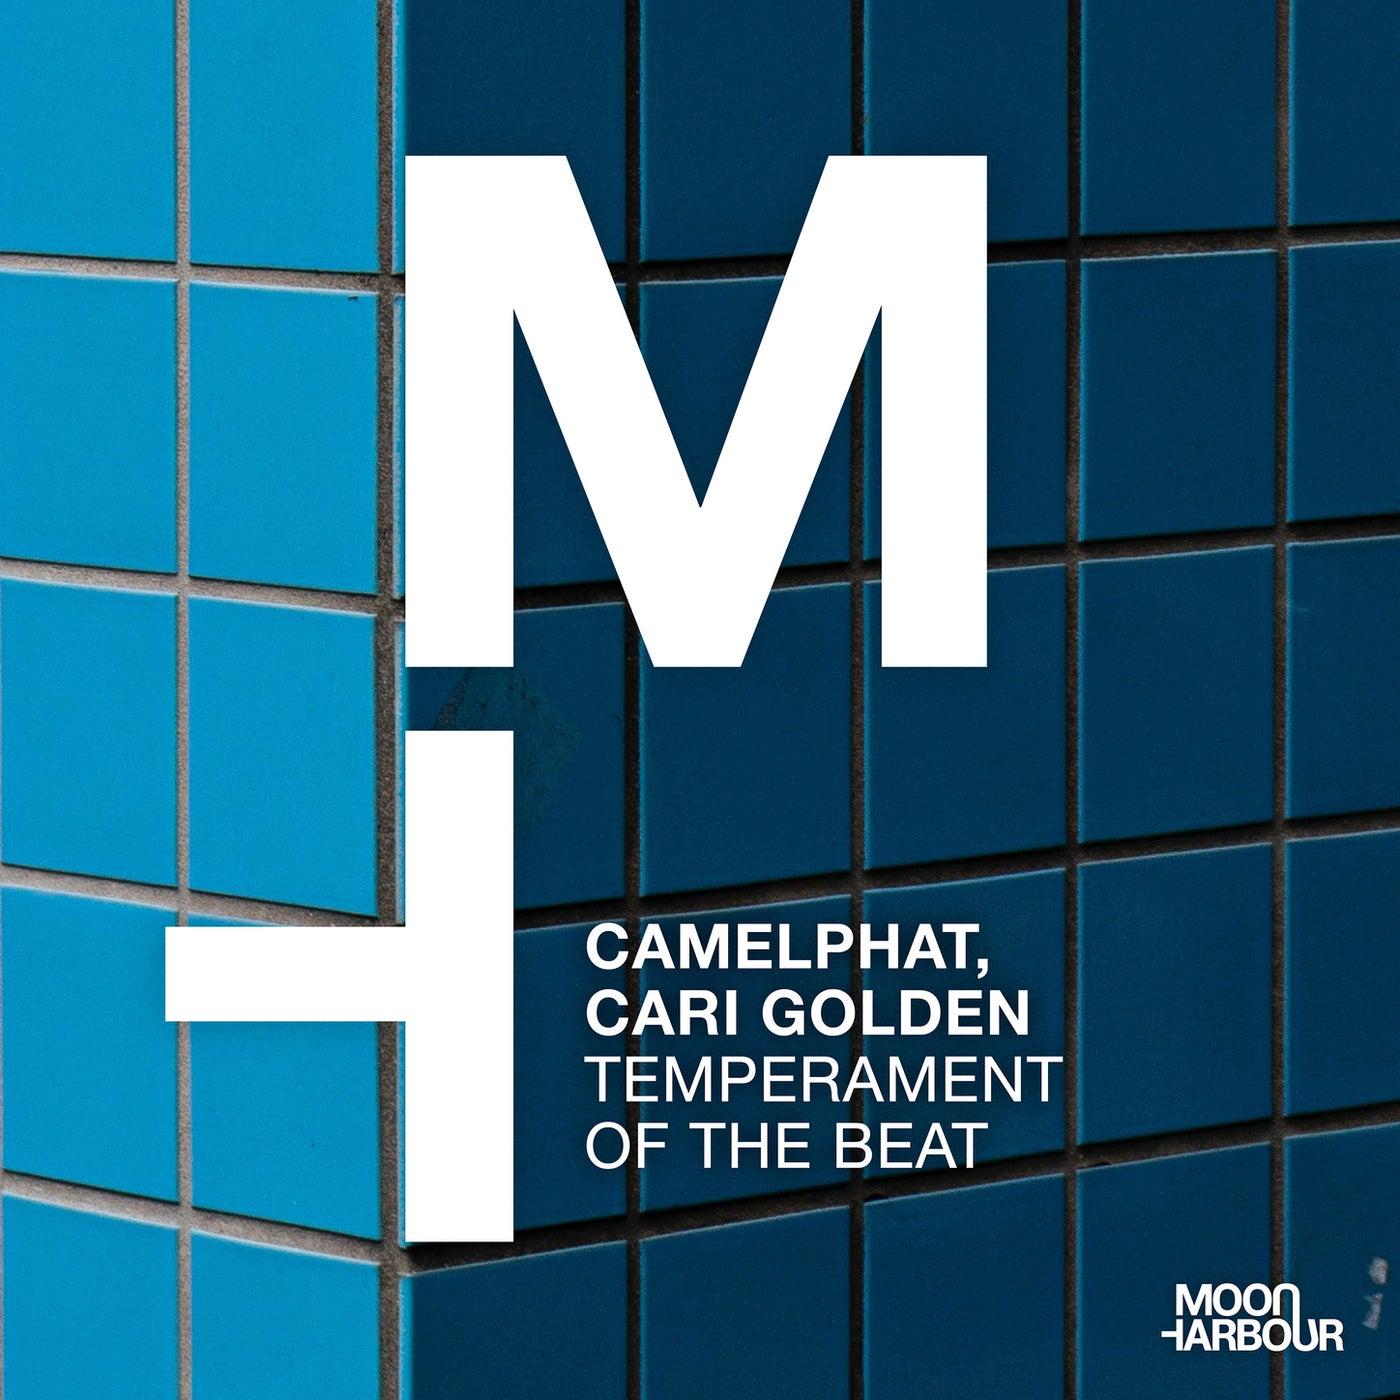 Temperament of the Beat (Original Mix)